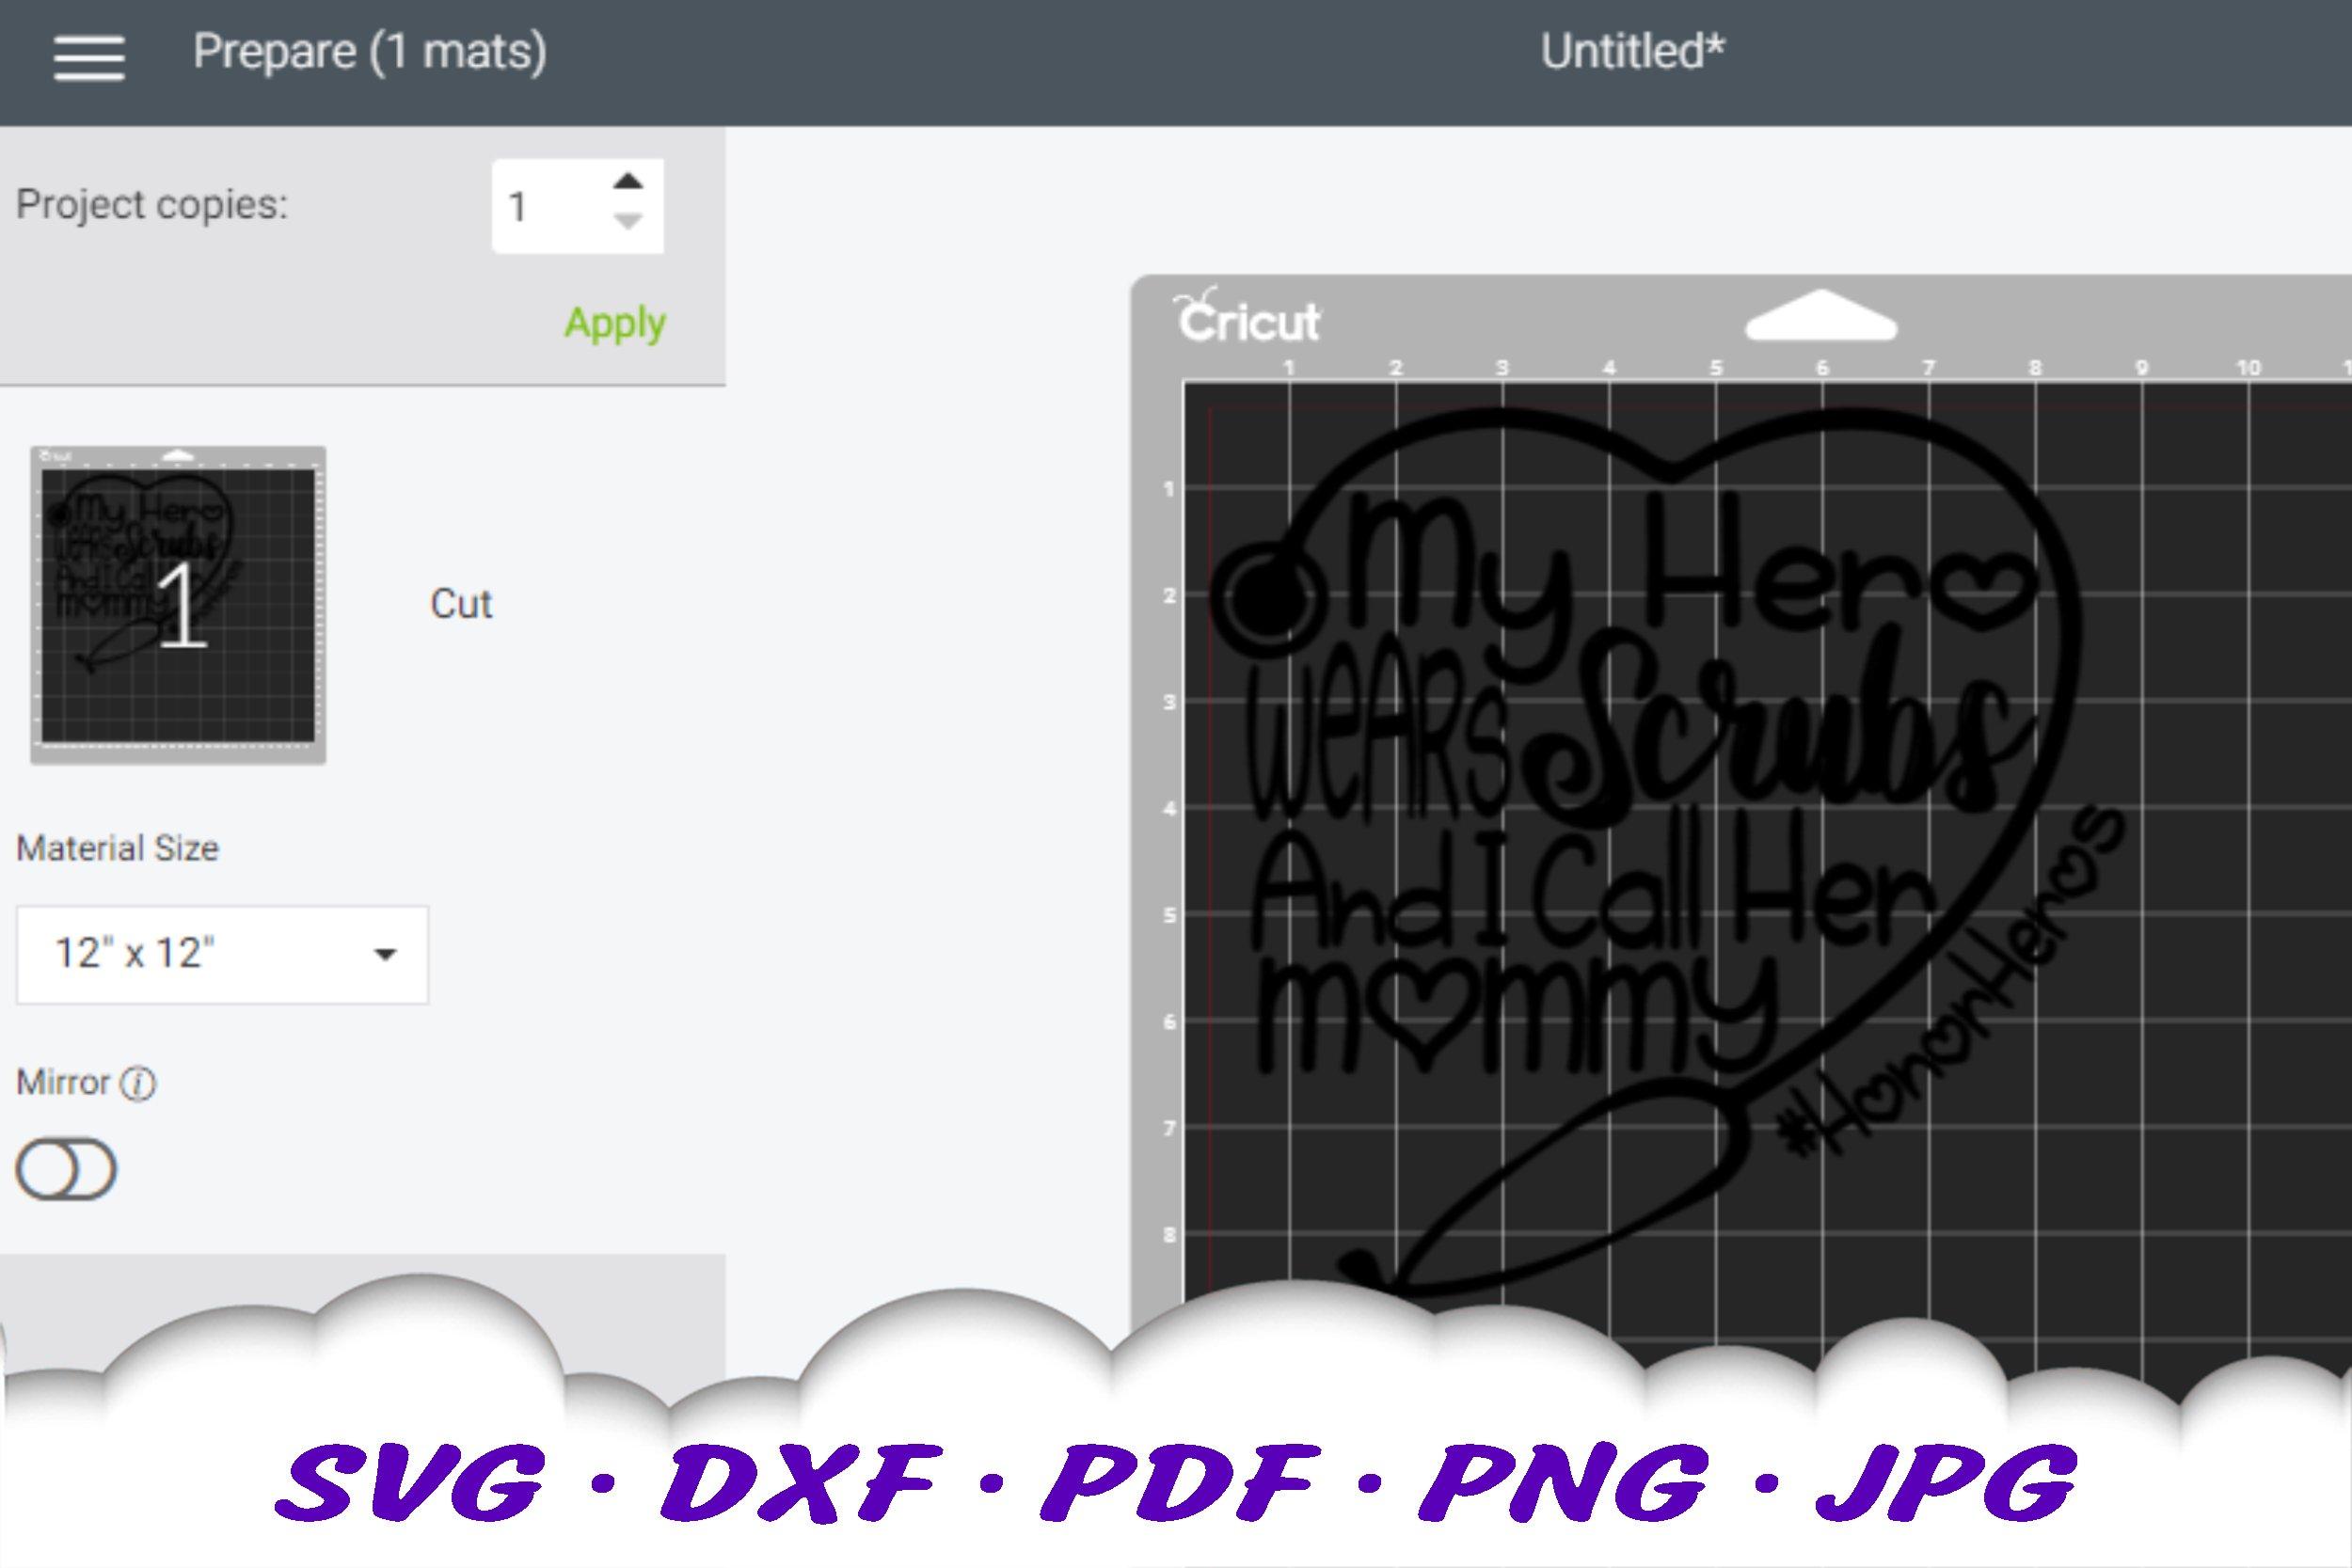 My Hero Scrubs Nurse Mom Stethoscope SVG DXF Cut Files example image 2